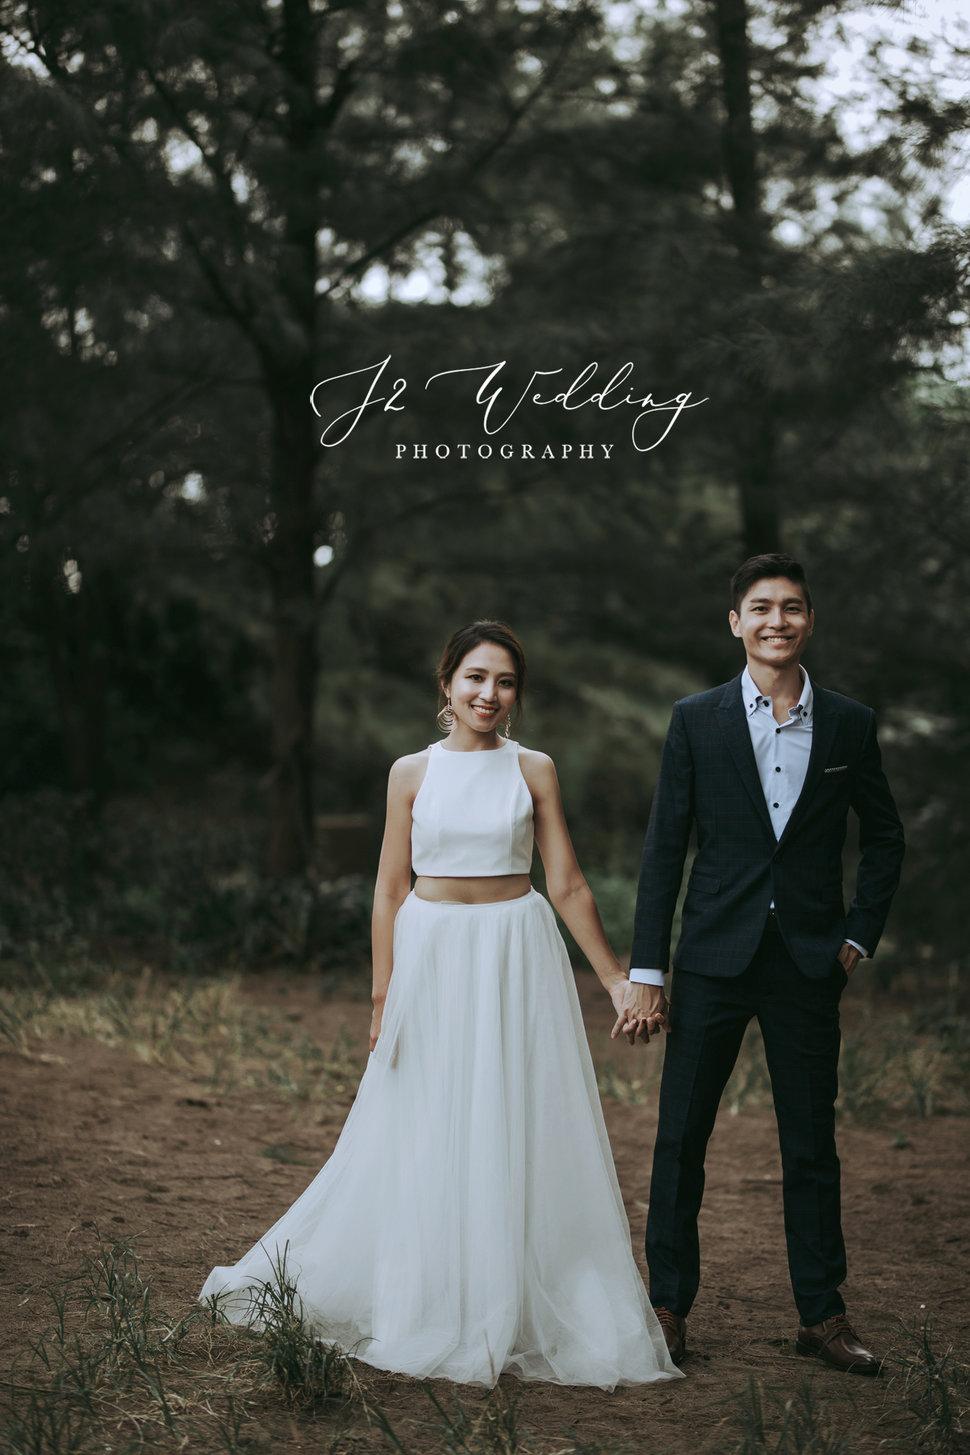 069A1286 - J2 wedding 中壢《結婚吧》